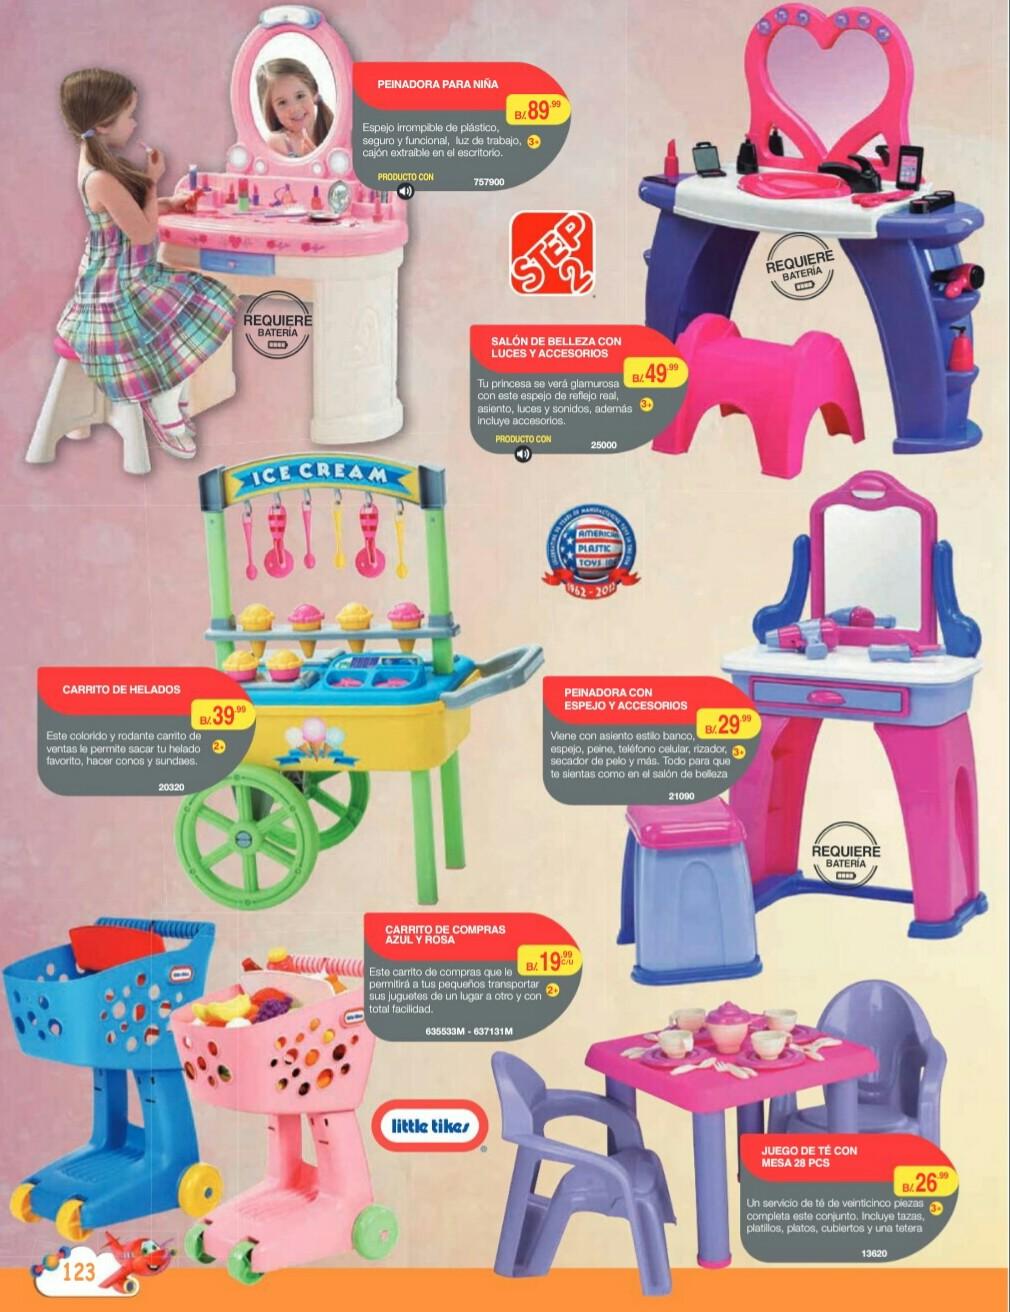 Catalogo juguetes Titan Toys 2018 p125